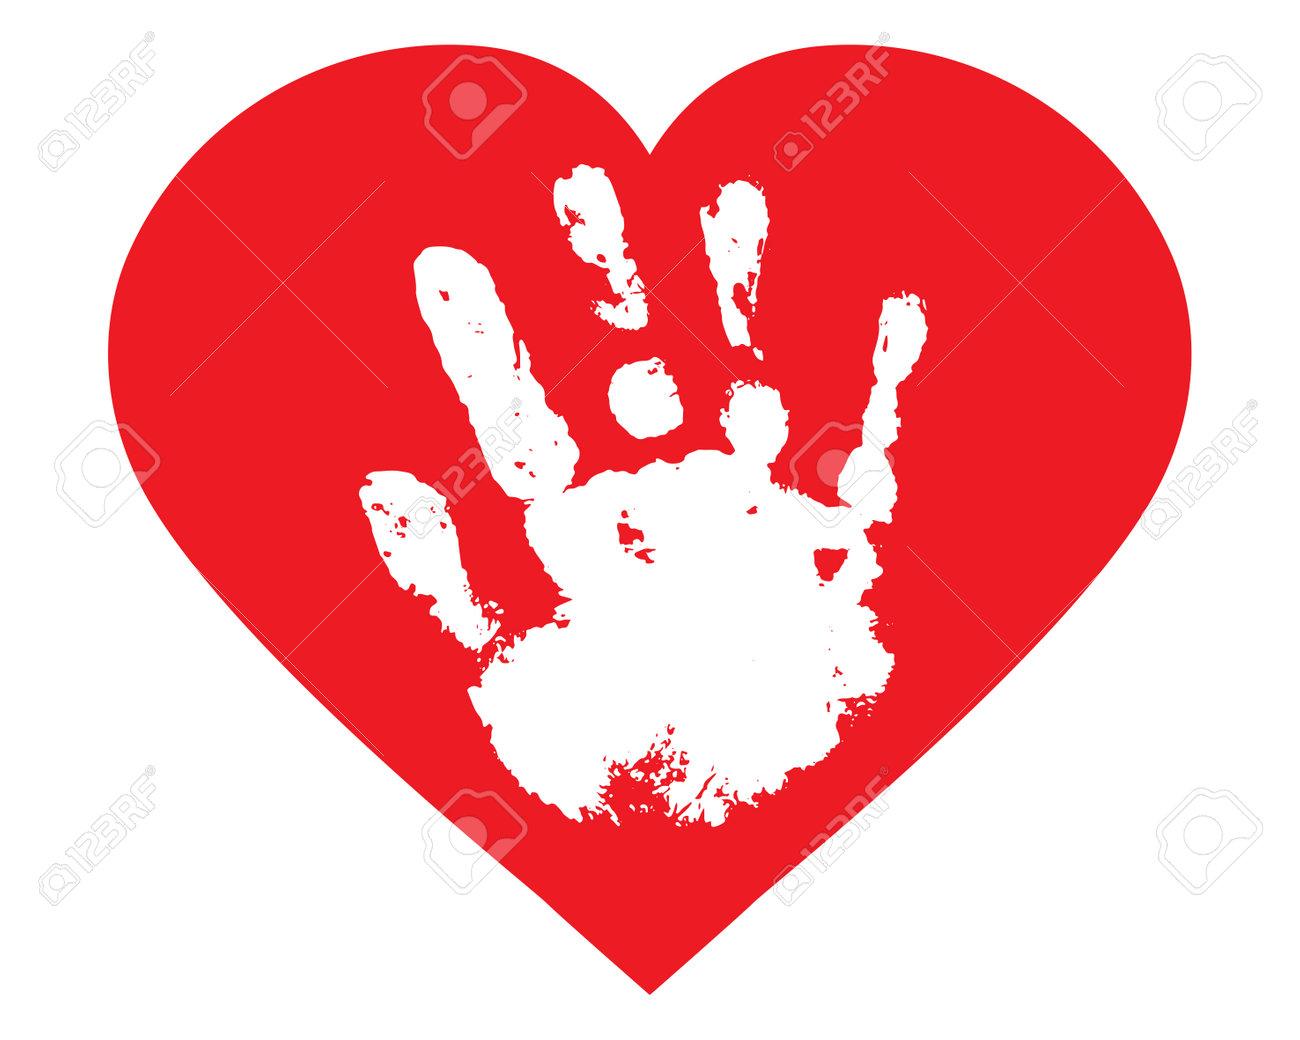 Baby palm of hand inside heart shape, handprint. Vector illustration - 164325313